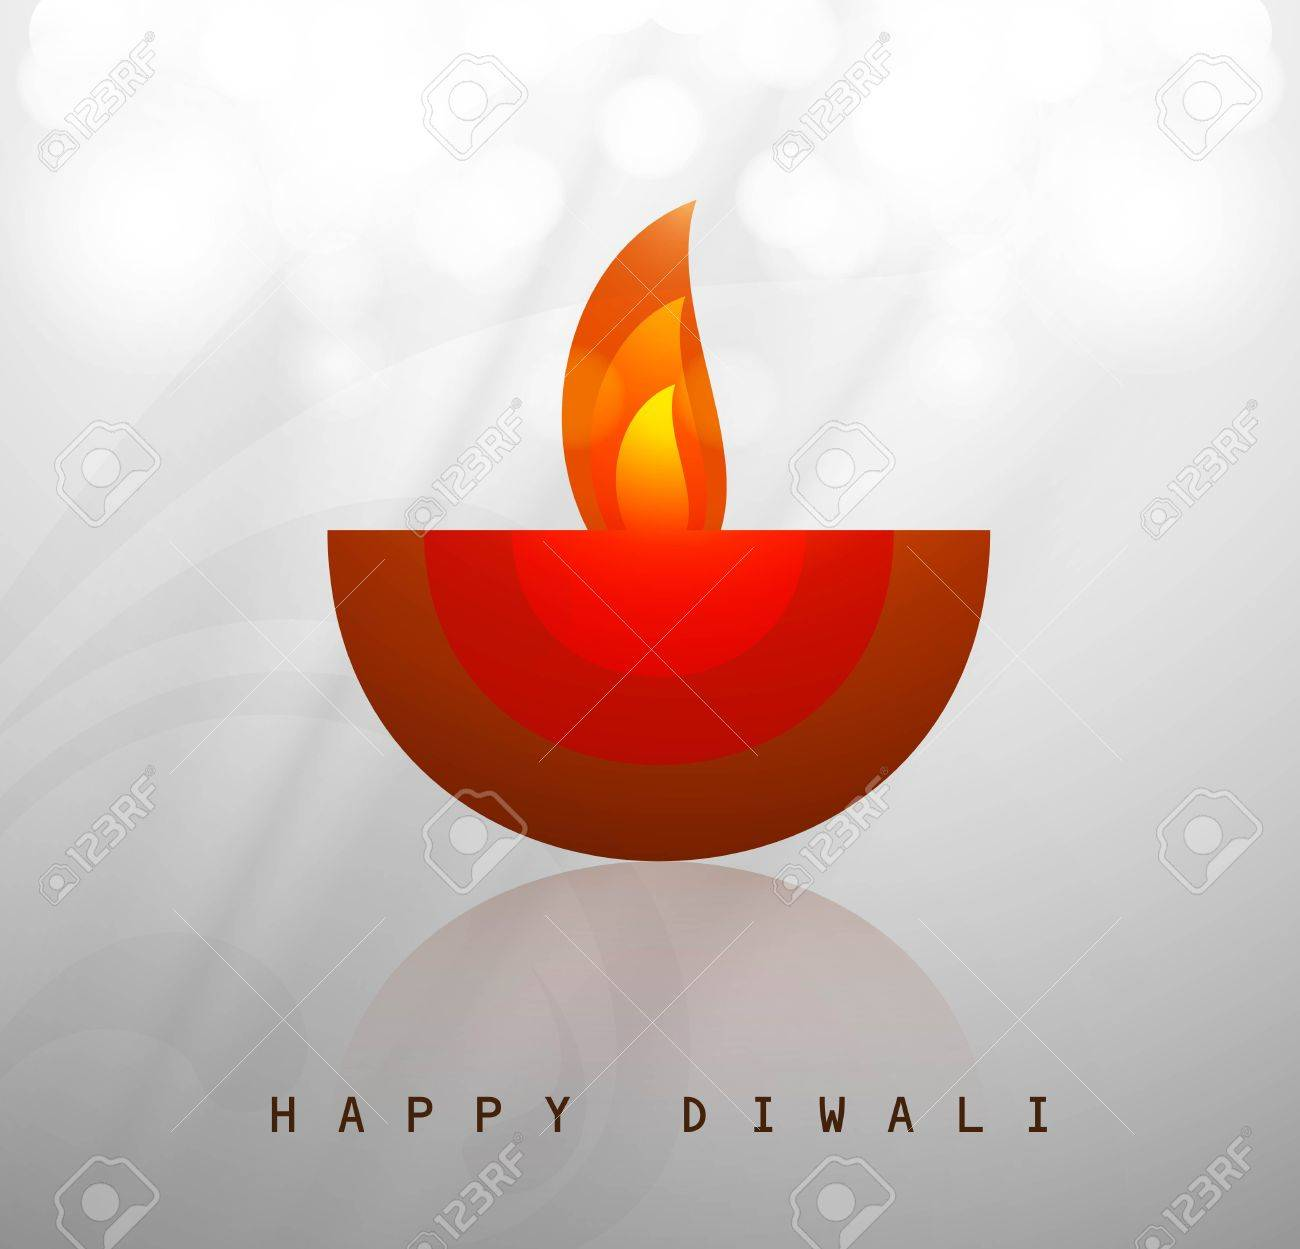 Beautiful happy diwali diya artwork vector Stock Vector - 18436051